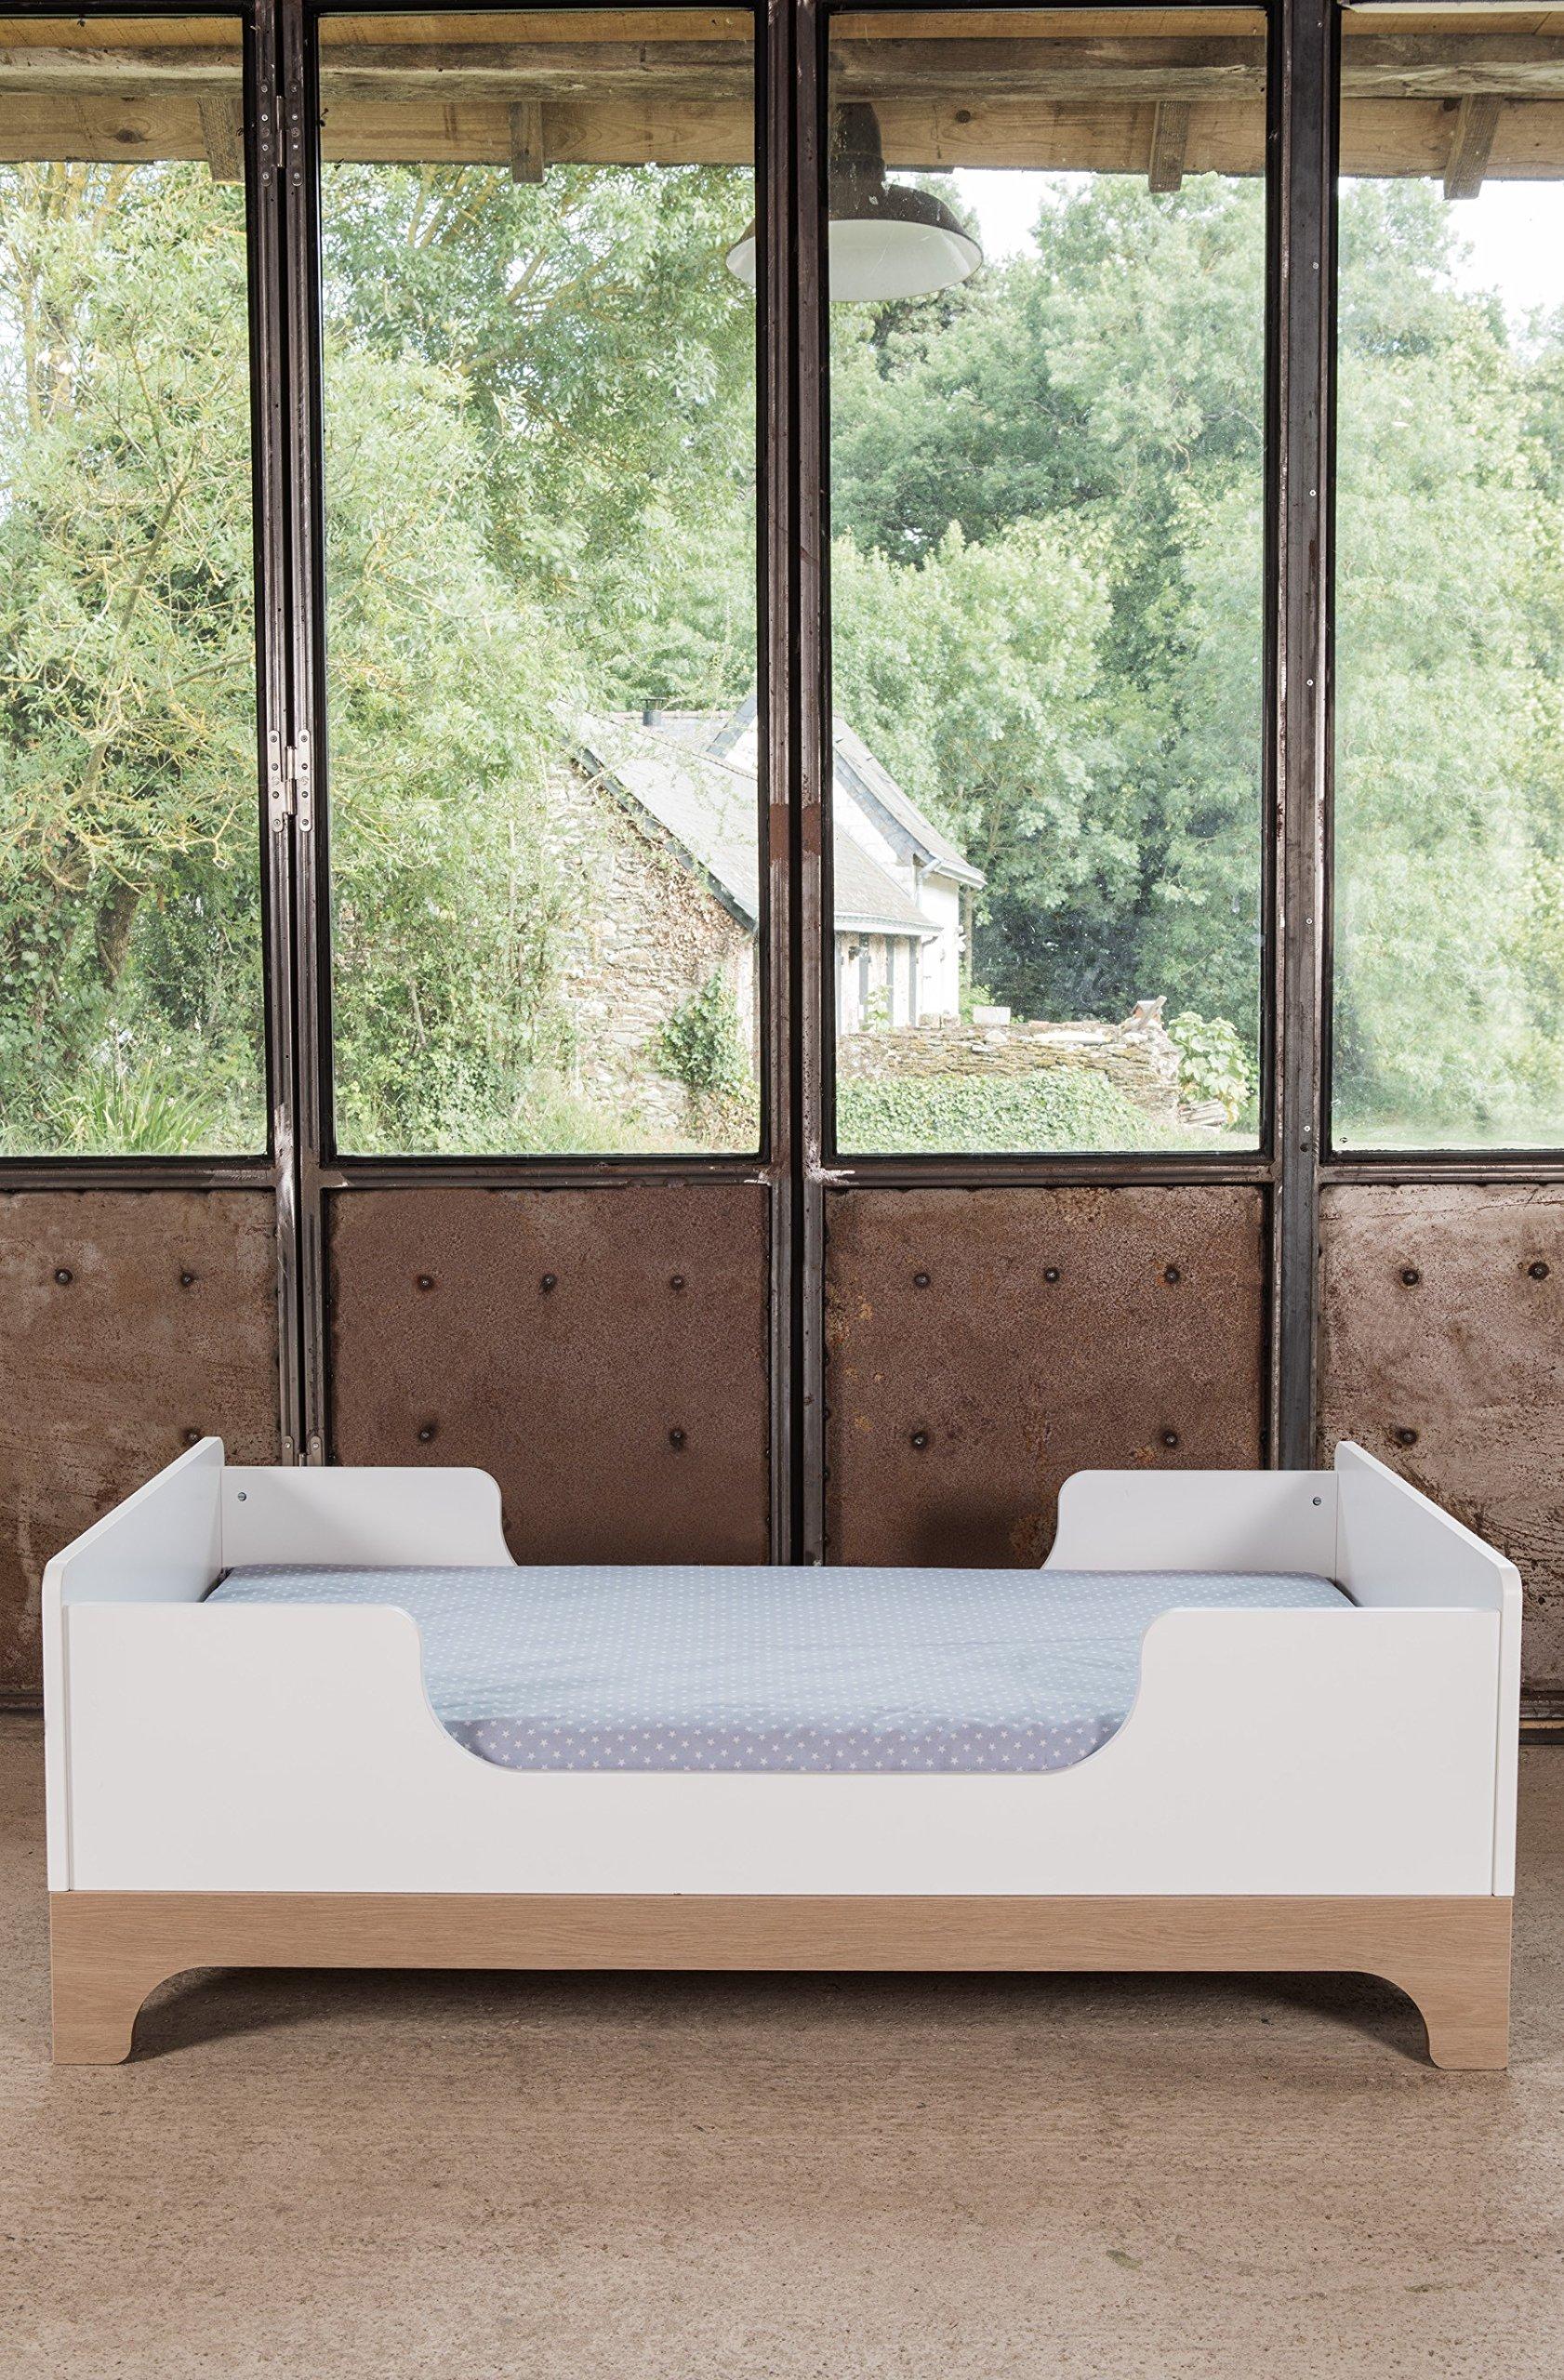 Kadolis Calvi Convertible Bed - 70 x 140 cm Blanco/Madera   1